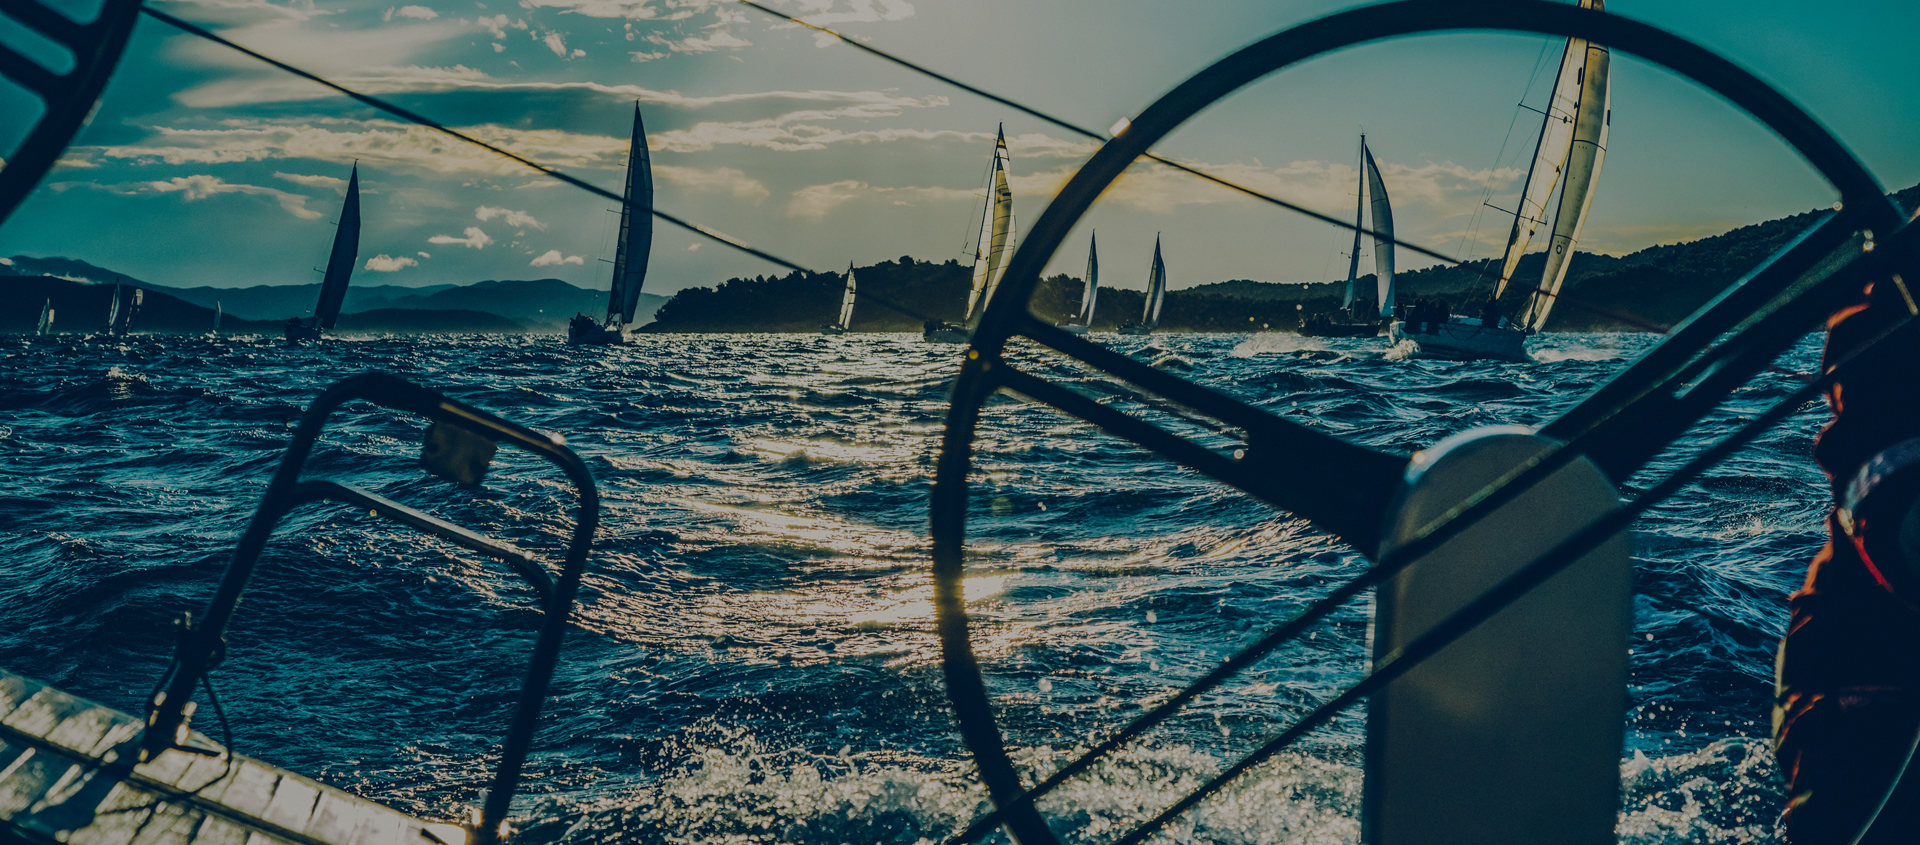 Bespoke marine insurance that won't rock the boat